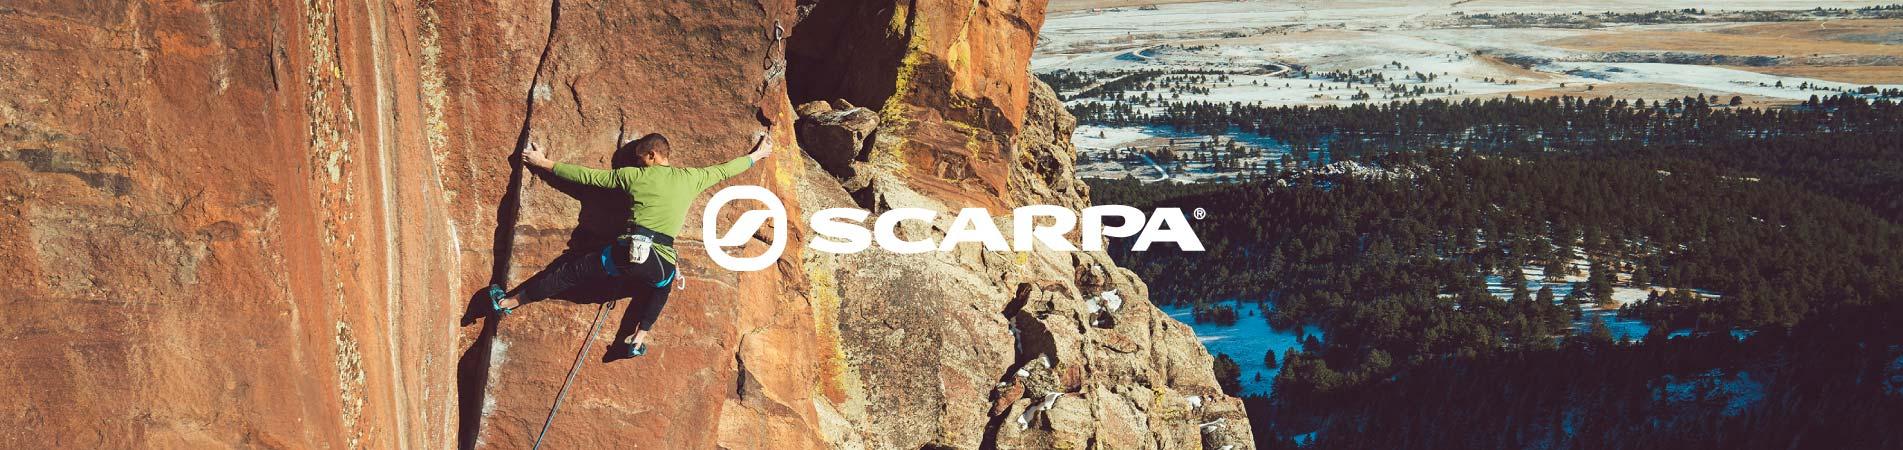 scarpa-summer-1-21.jpg